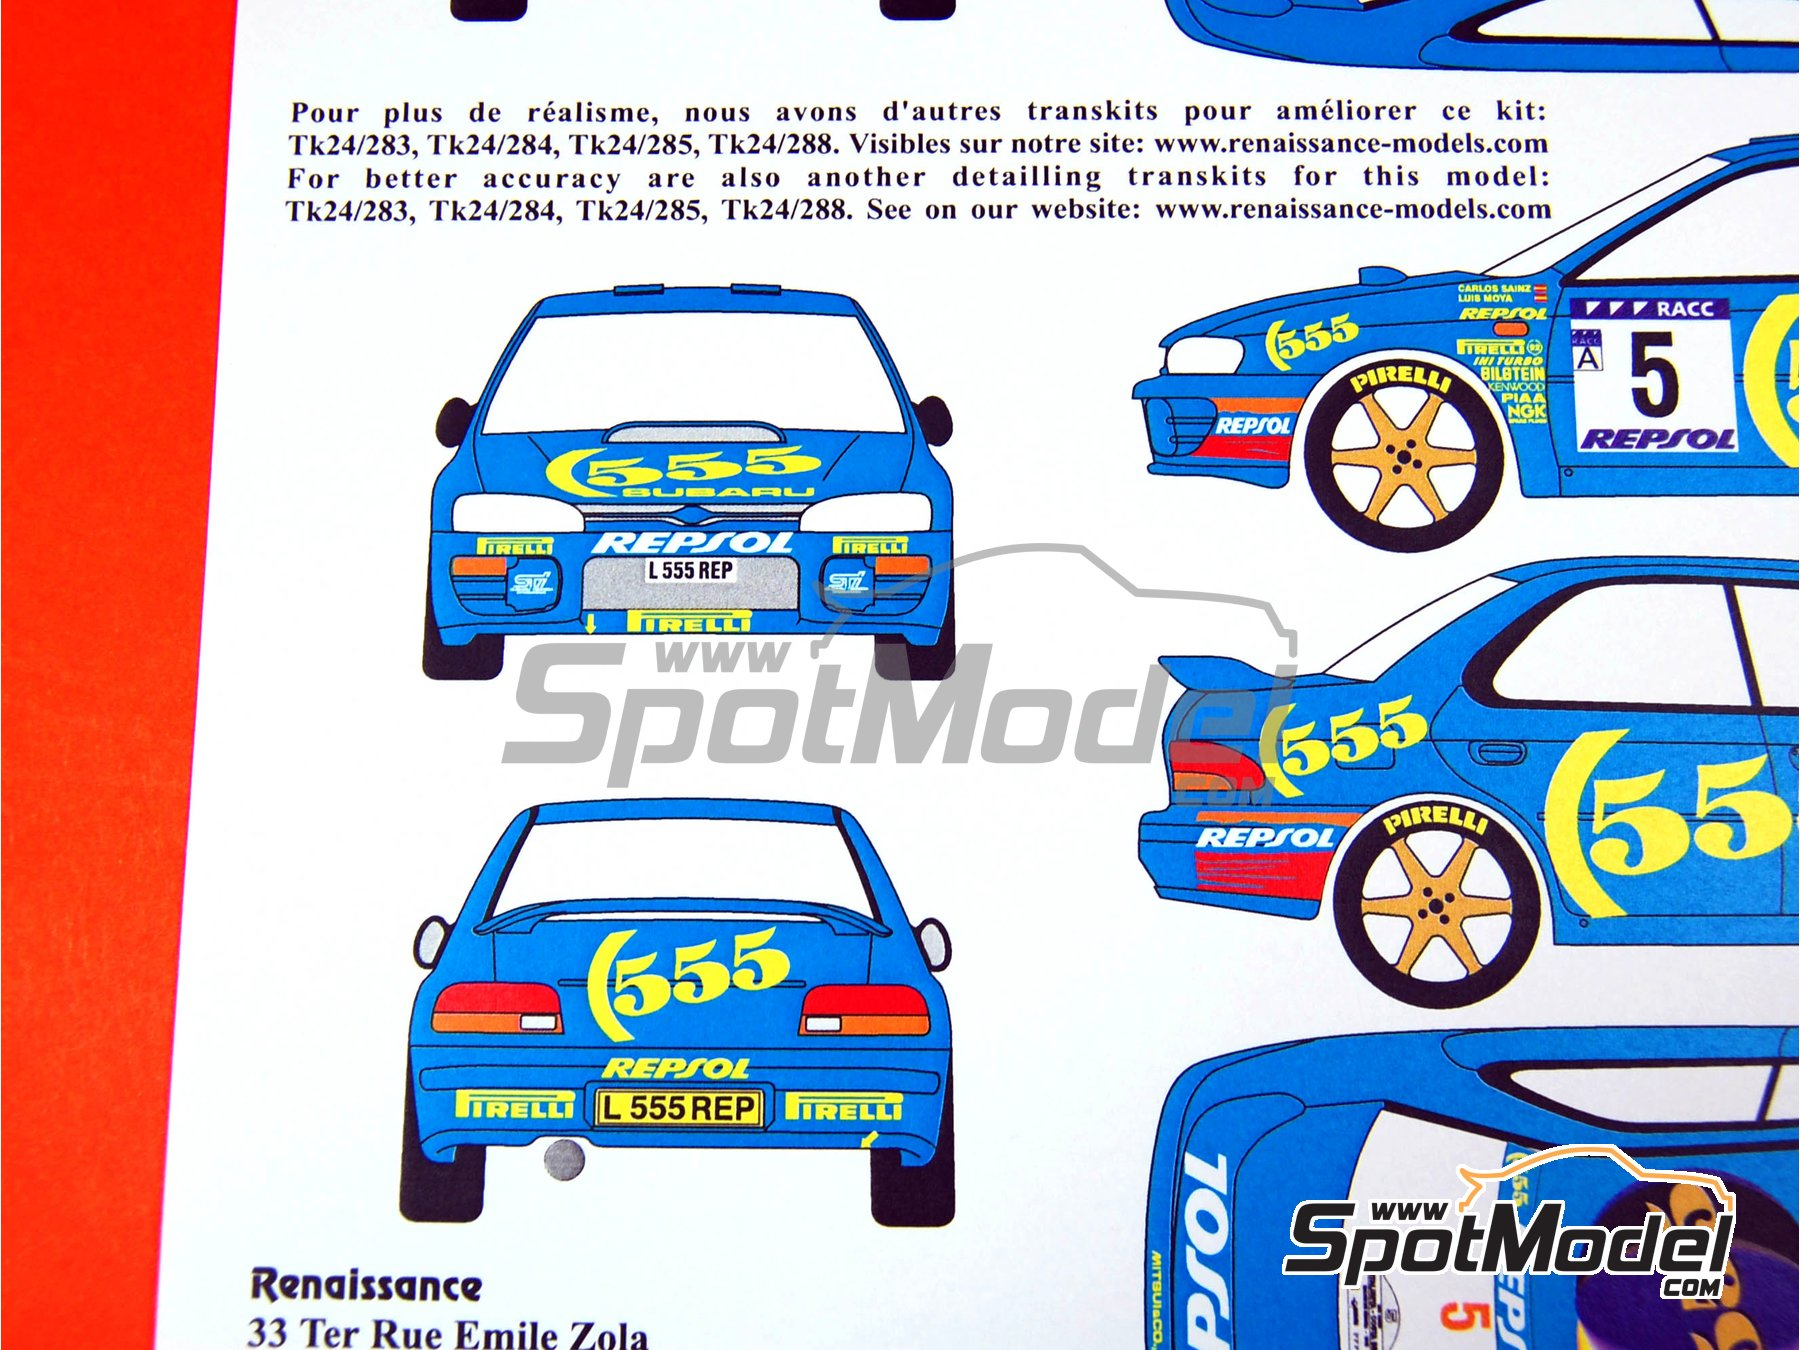 Image 5: Subaru Impreza 555 Group A - Catalunya Costa Dorada RACC Rally, RAC Rally 1995 | Marking / livery in 1/24 scale manufactured by Renaissance Models (ref.TK24-289)